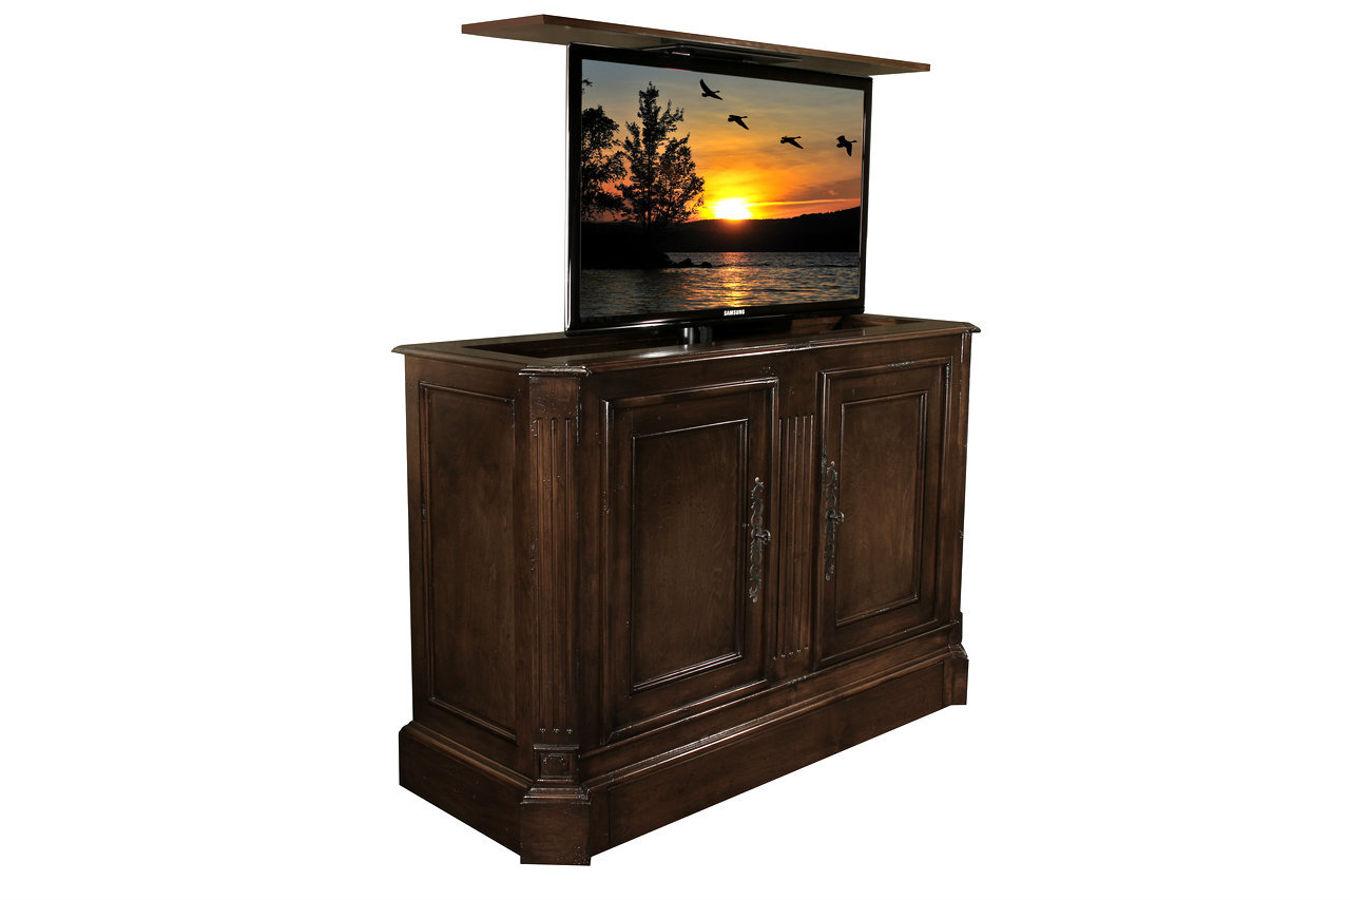 Flat screen tv riser  Sierra TV lift cabinets